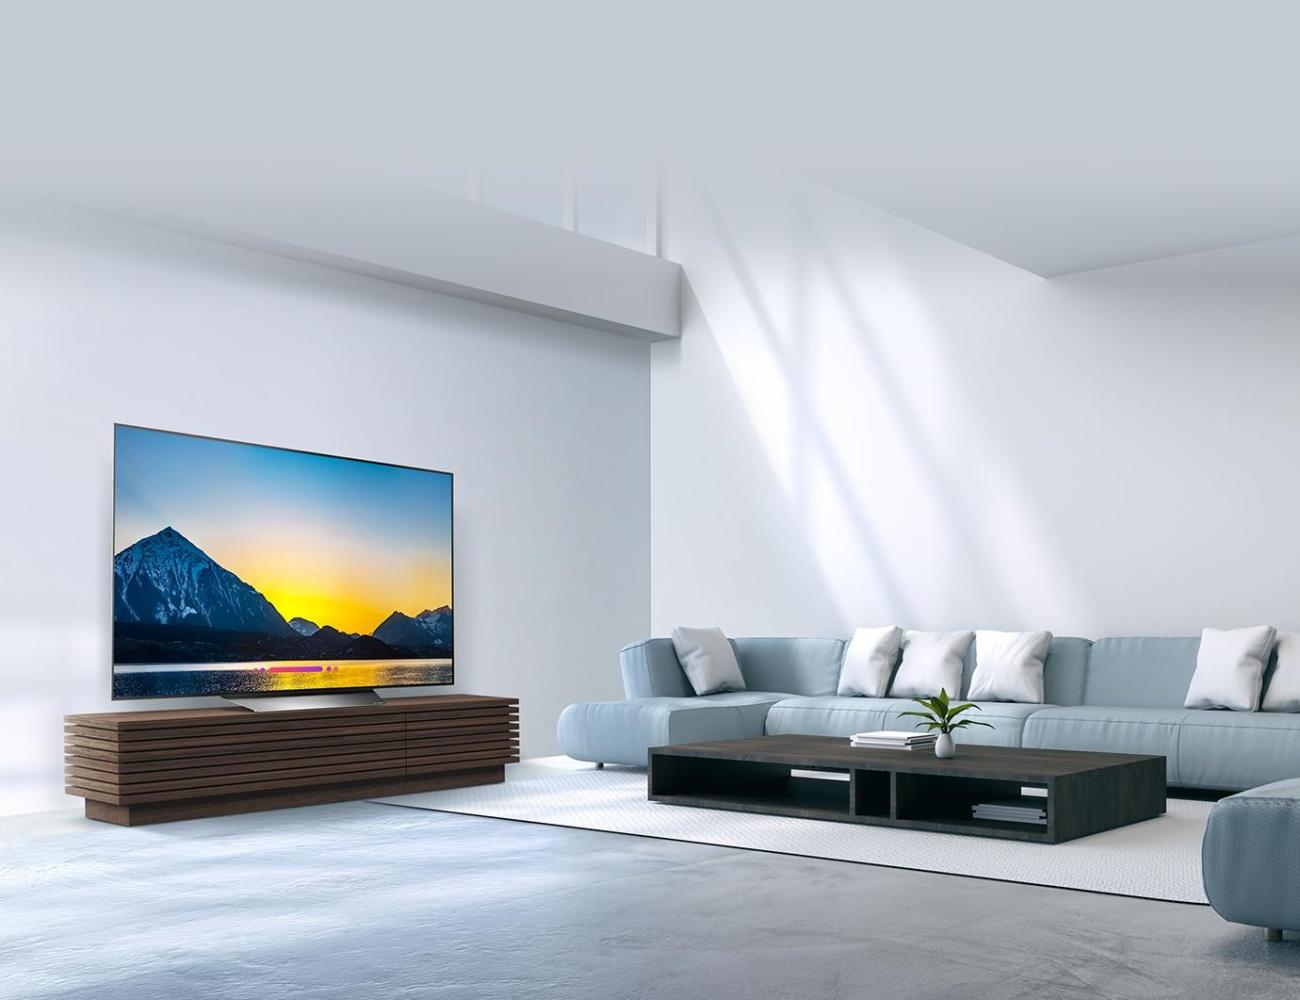 LG vs  Samsung smart tv comparison (best of smart TV tech 2019)